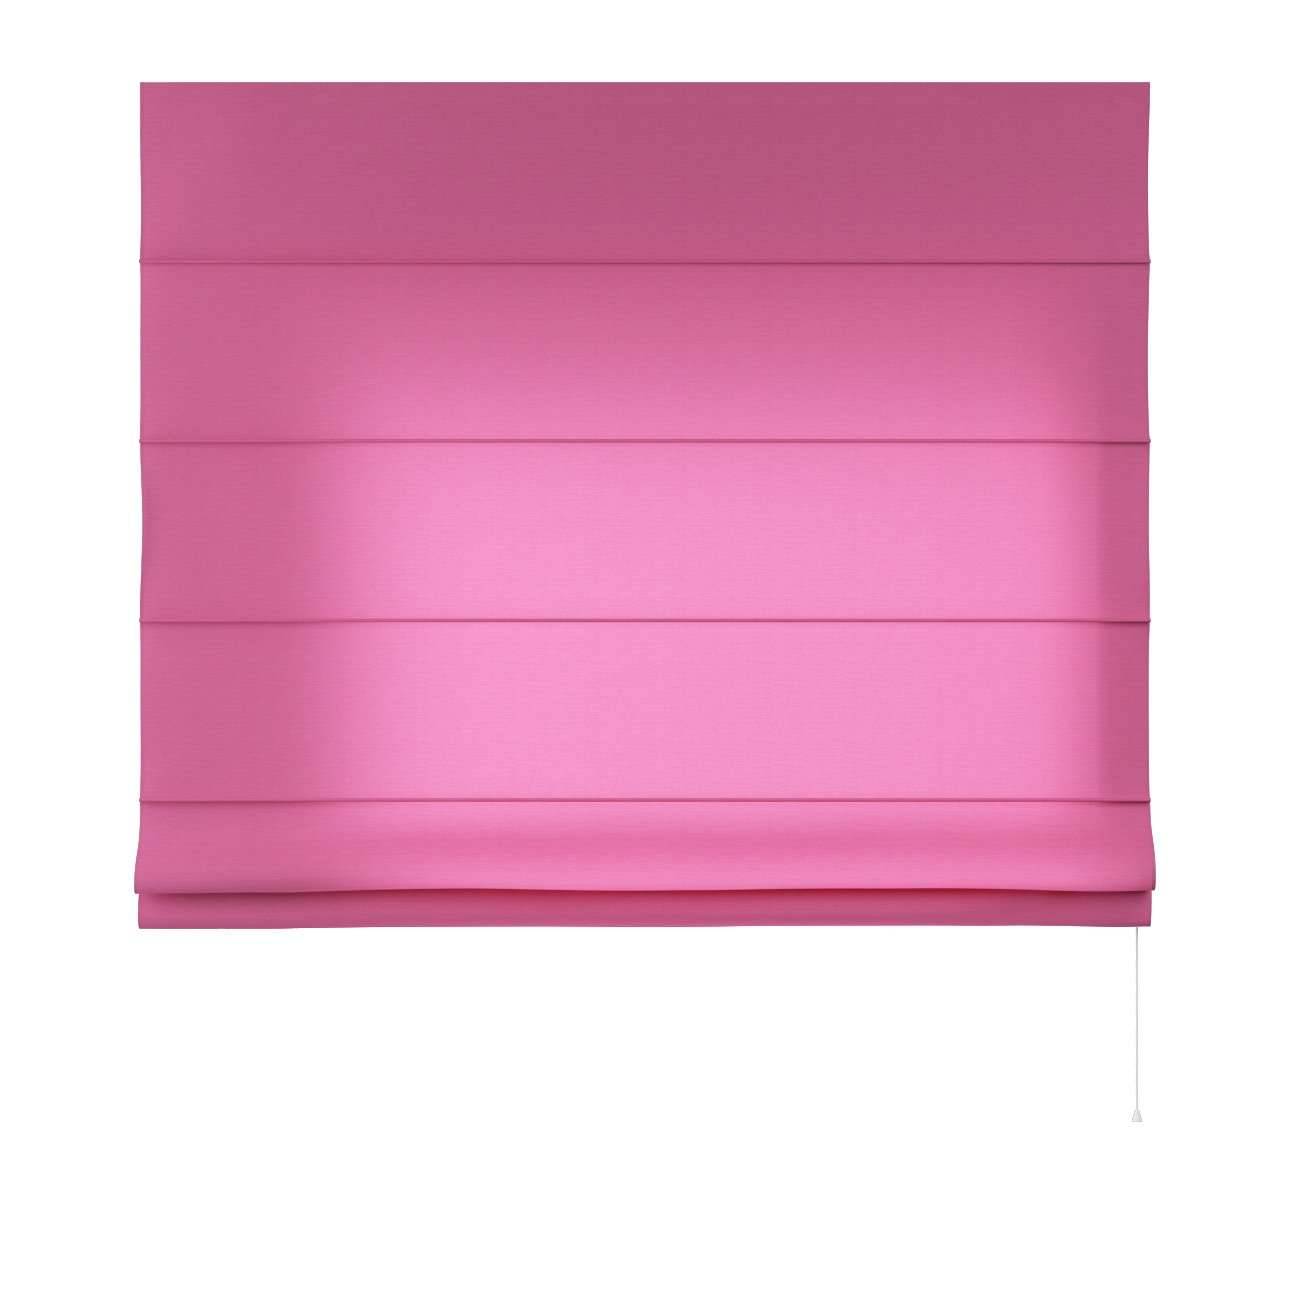 Foldegardin Capri<br/>Uden flæsekant 80 x 170 cm fra kollektionen Jupiter, Stof: 127-24